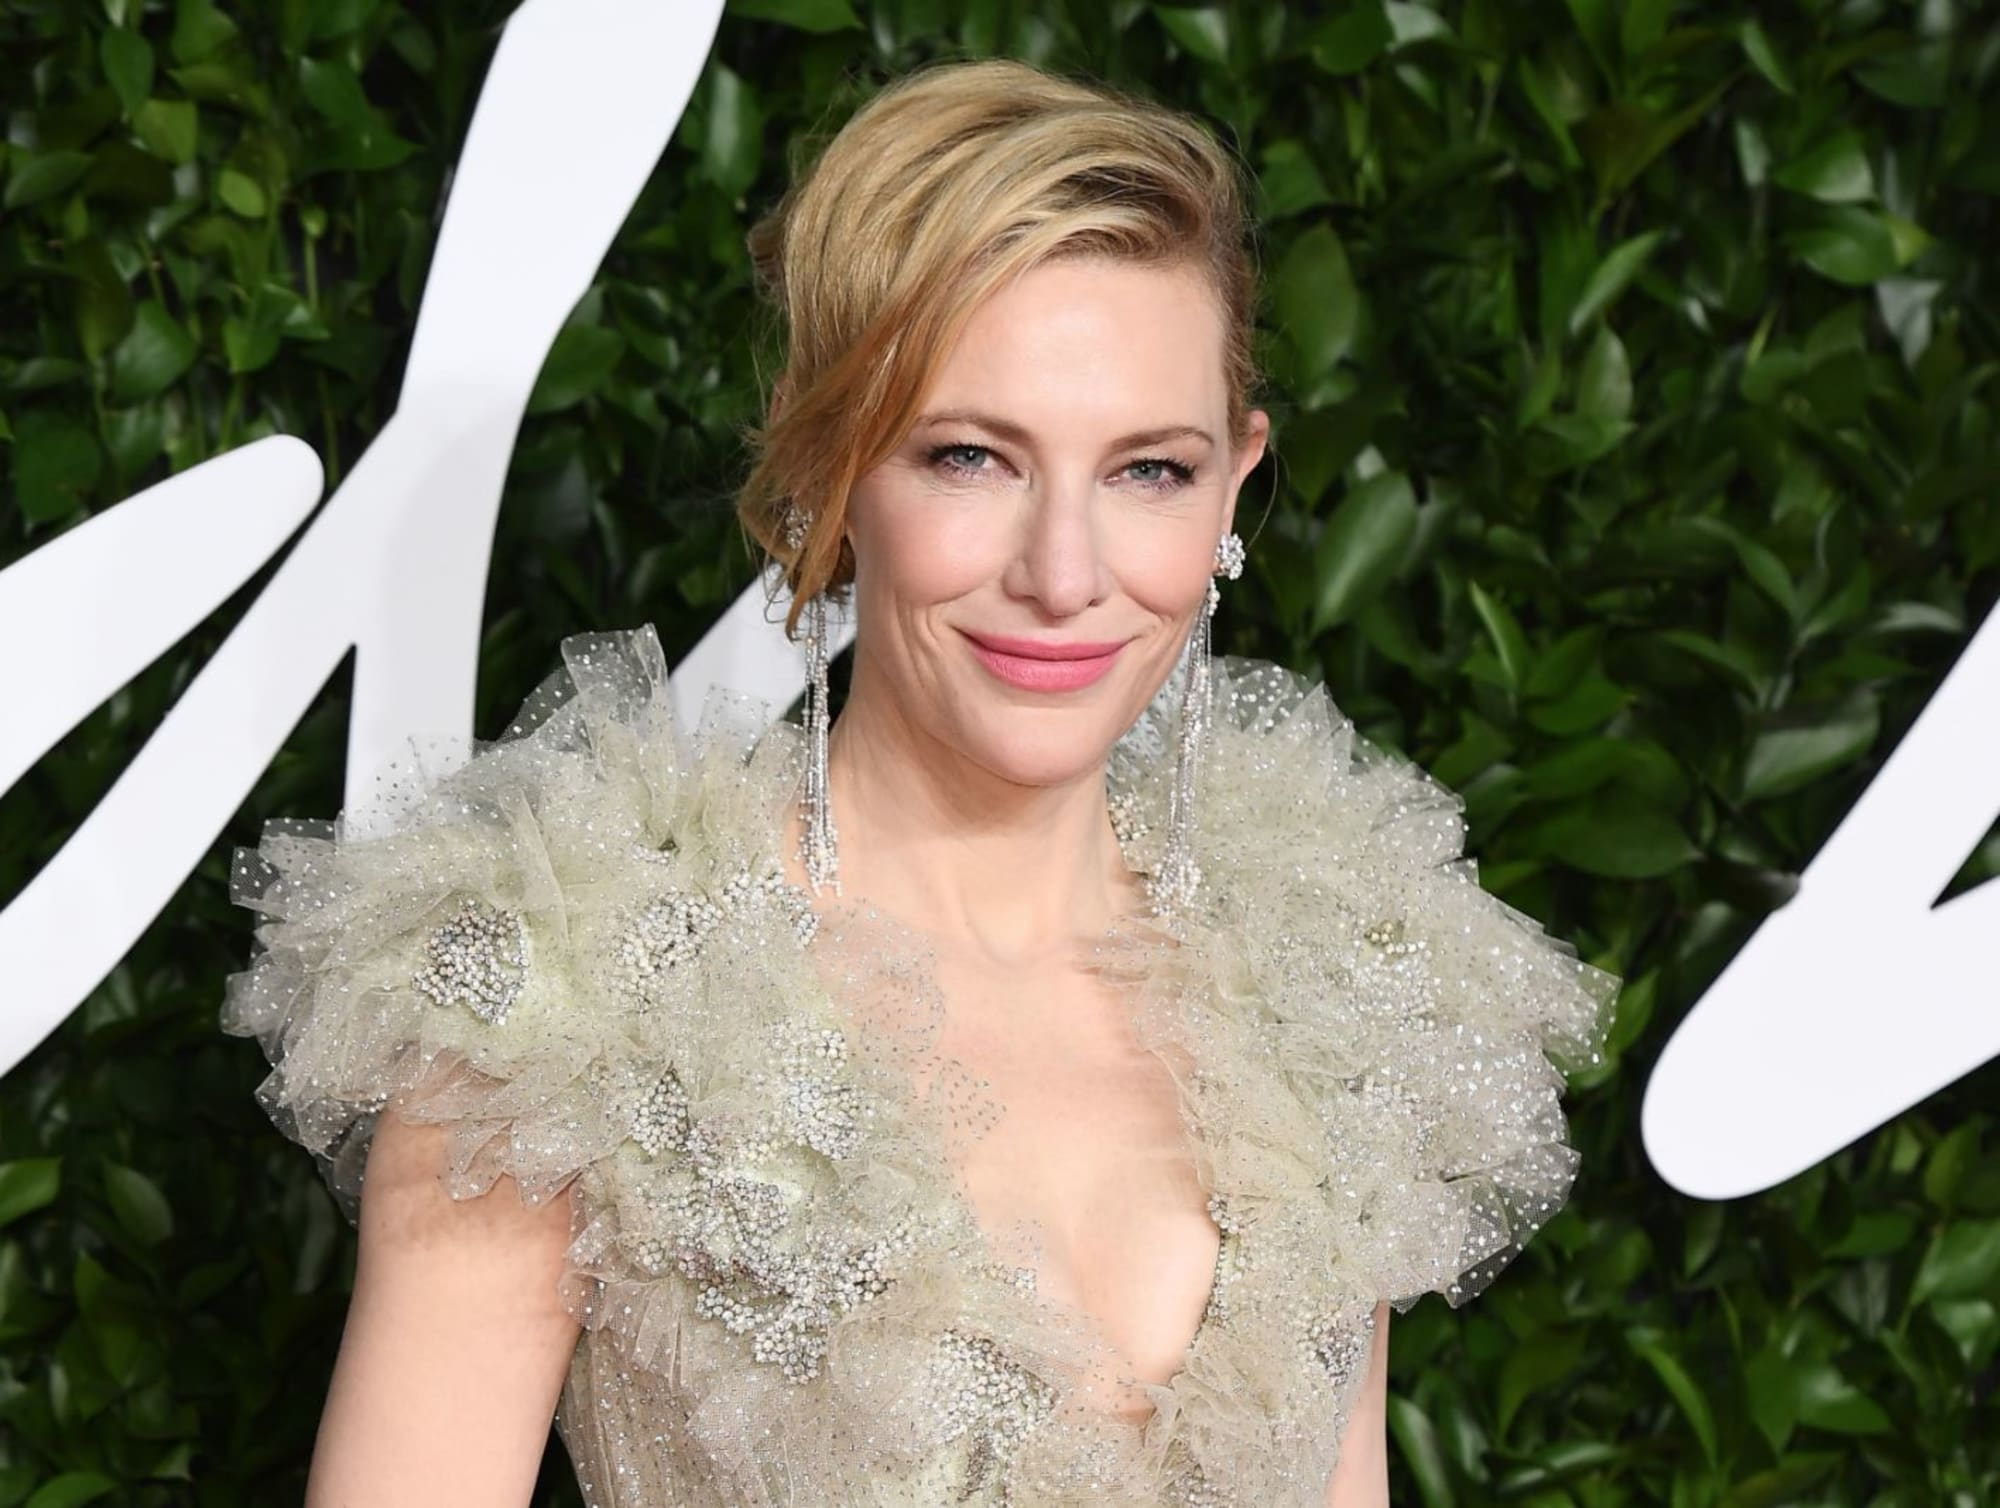 Cate Blanchett joins Eli Roth's Borderlands movie